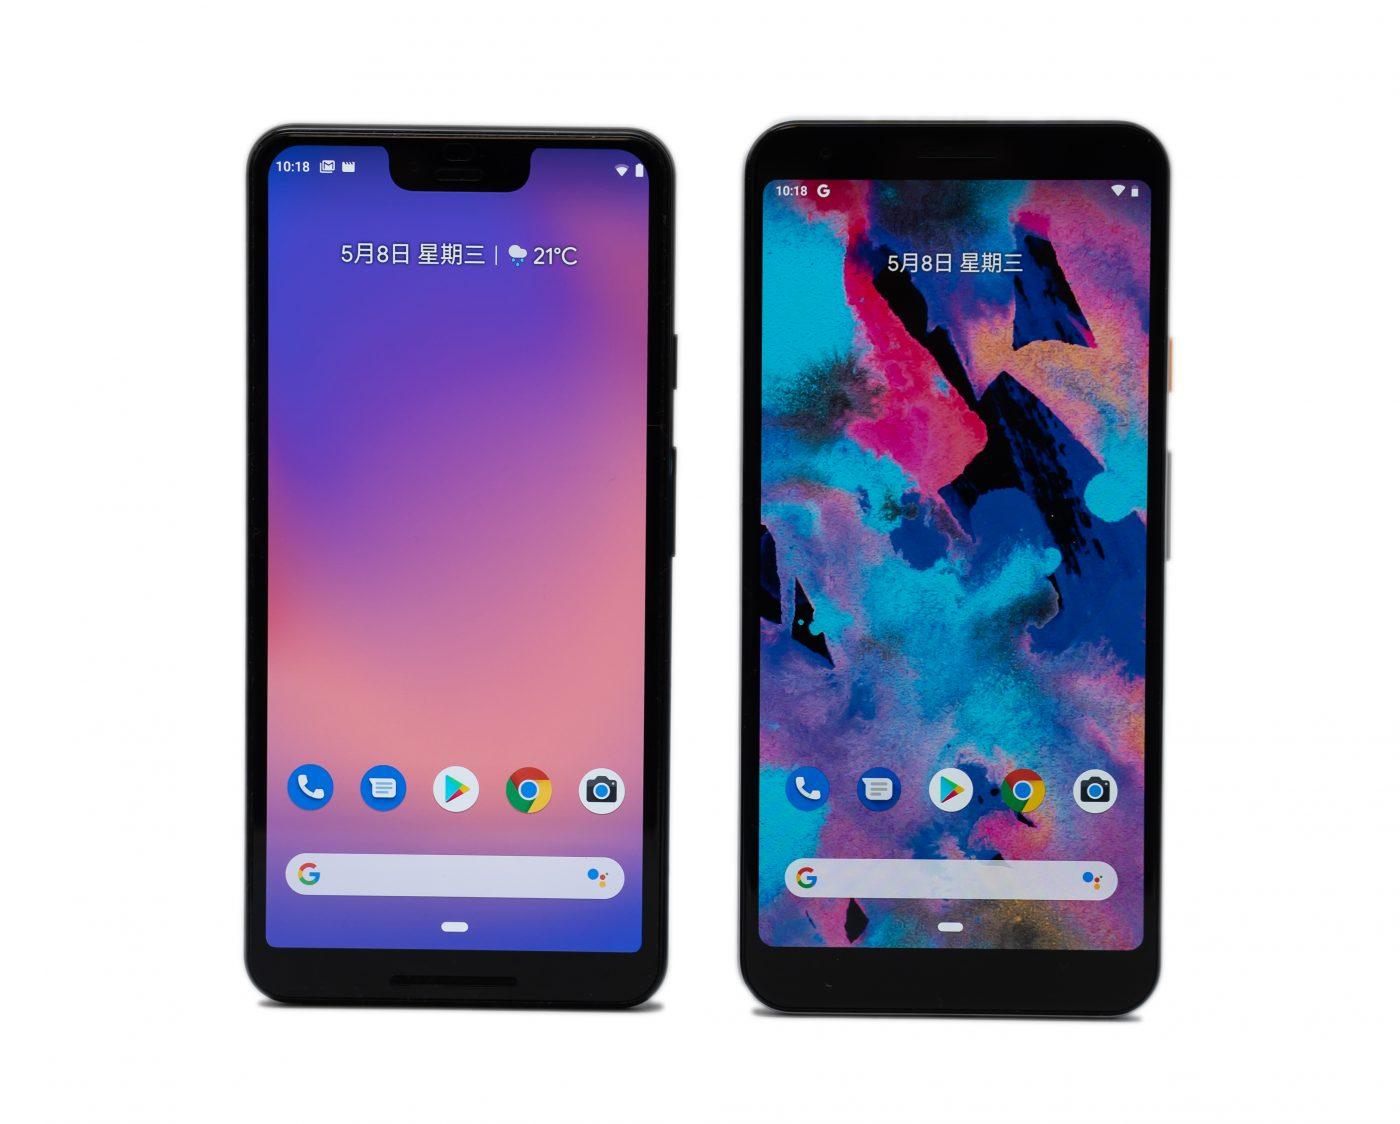 Google Pixel 3a XL (3) 彙整 Google 3a / 3a XL 與 Google Pixel 3 / 3 XL 規格表整理 @3C 達人廖阿輝